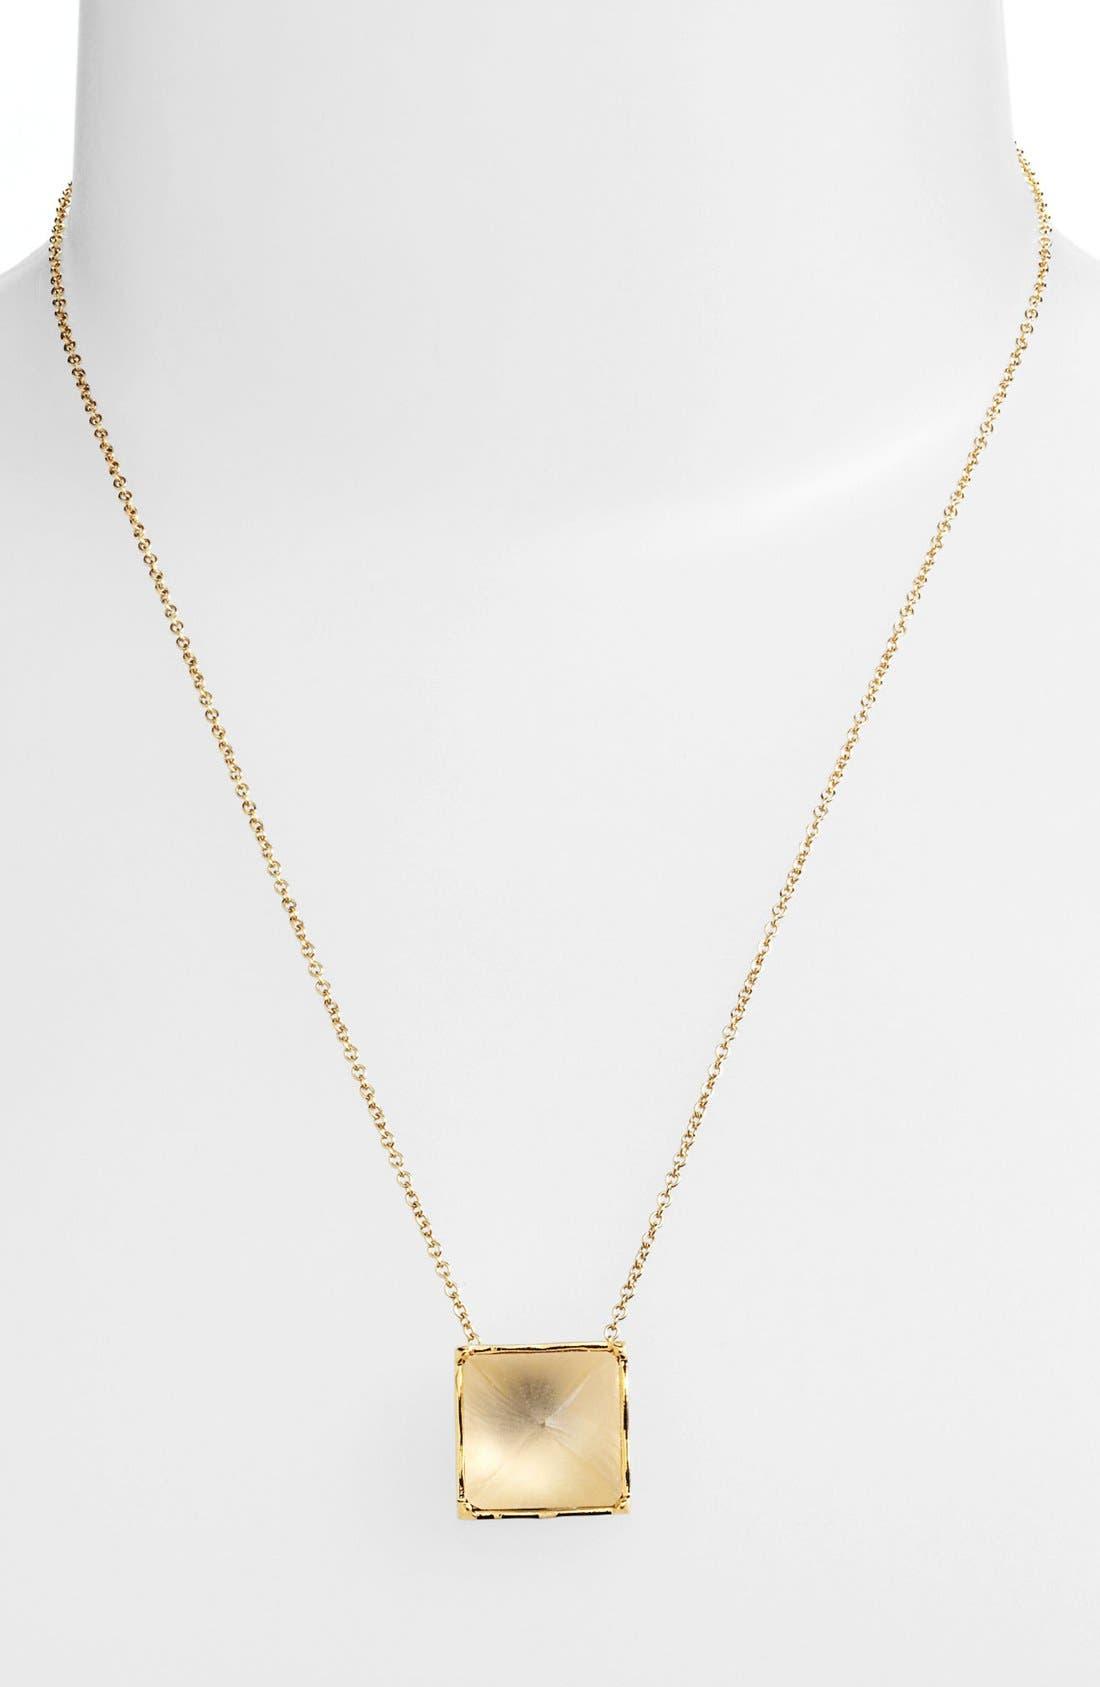 Main Image - Alexis Bittar 'Lucite®' Pyramid Pendant Necklace